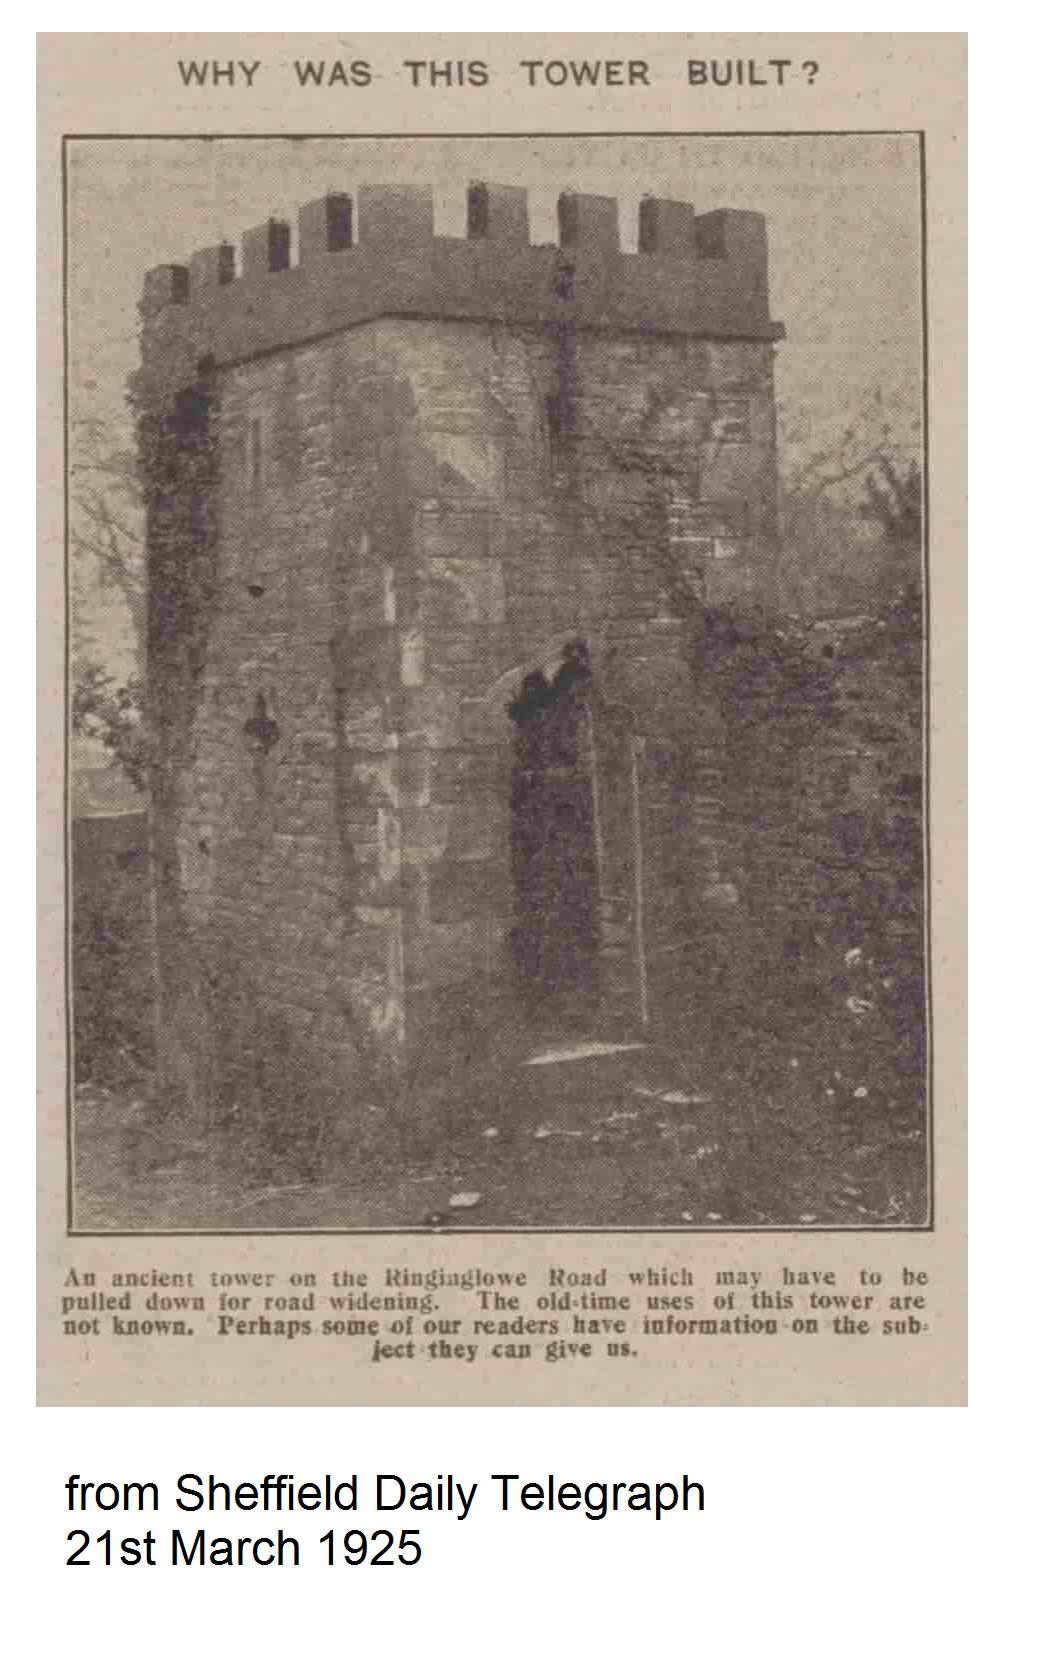 Ringinglow Tower